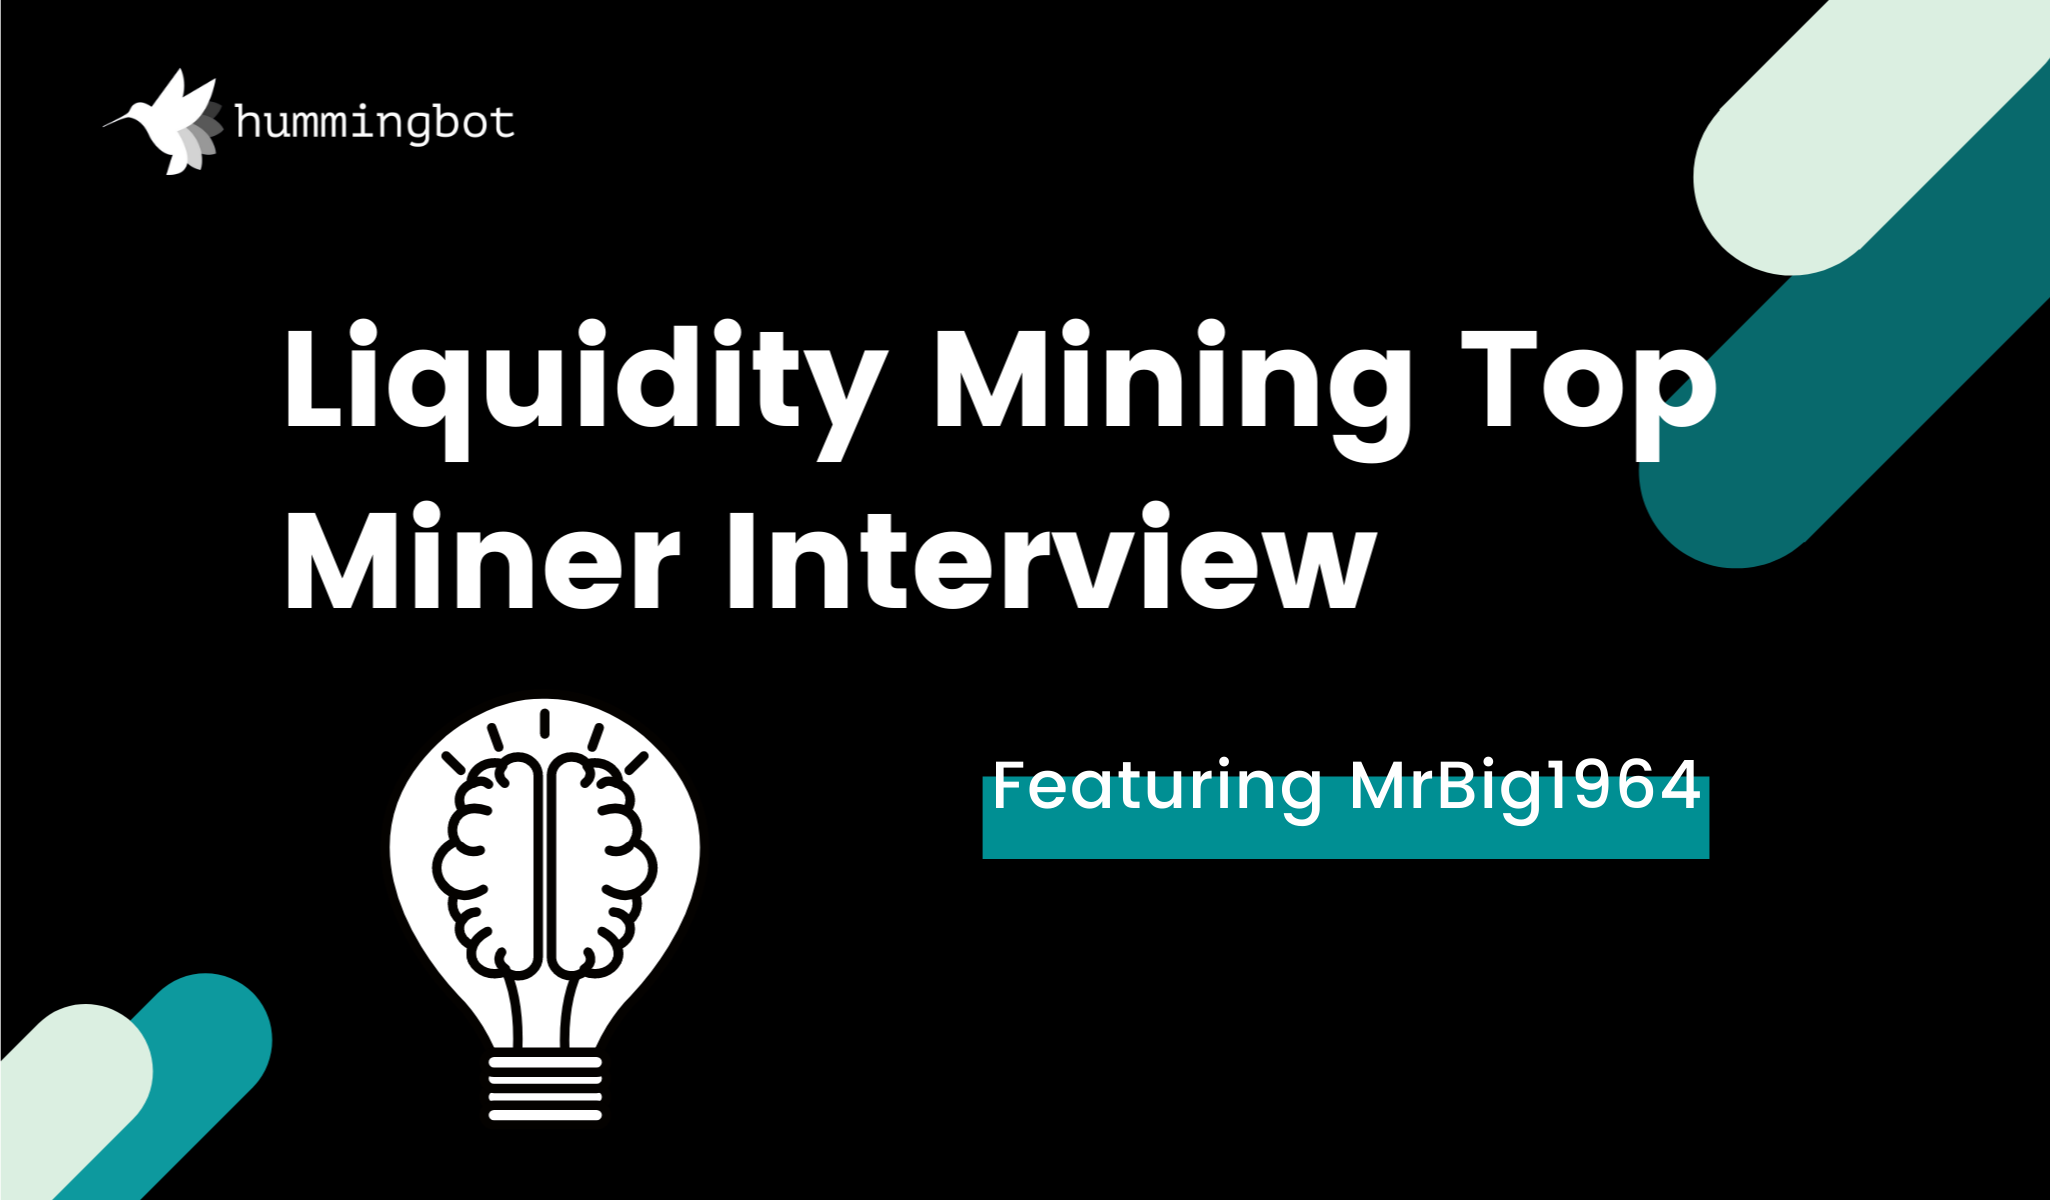 Top liquidity miner interview featuring Mr Big